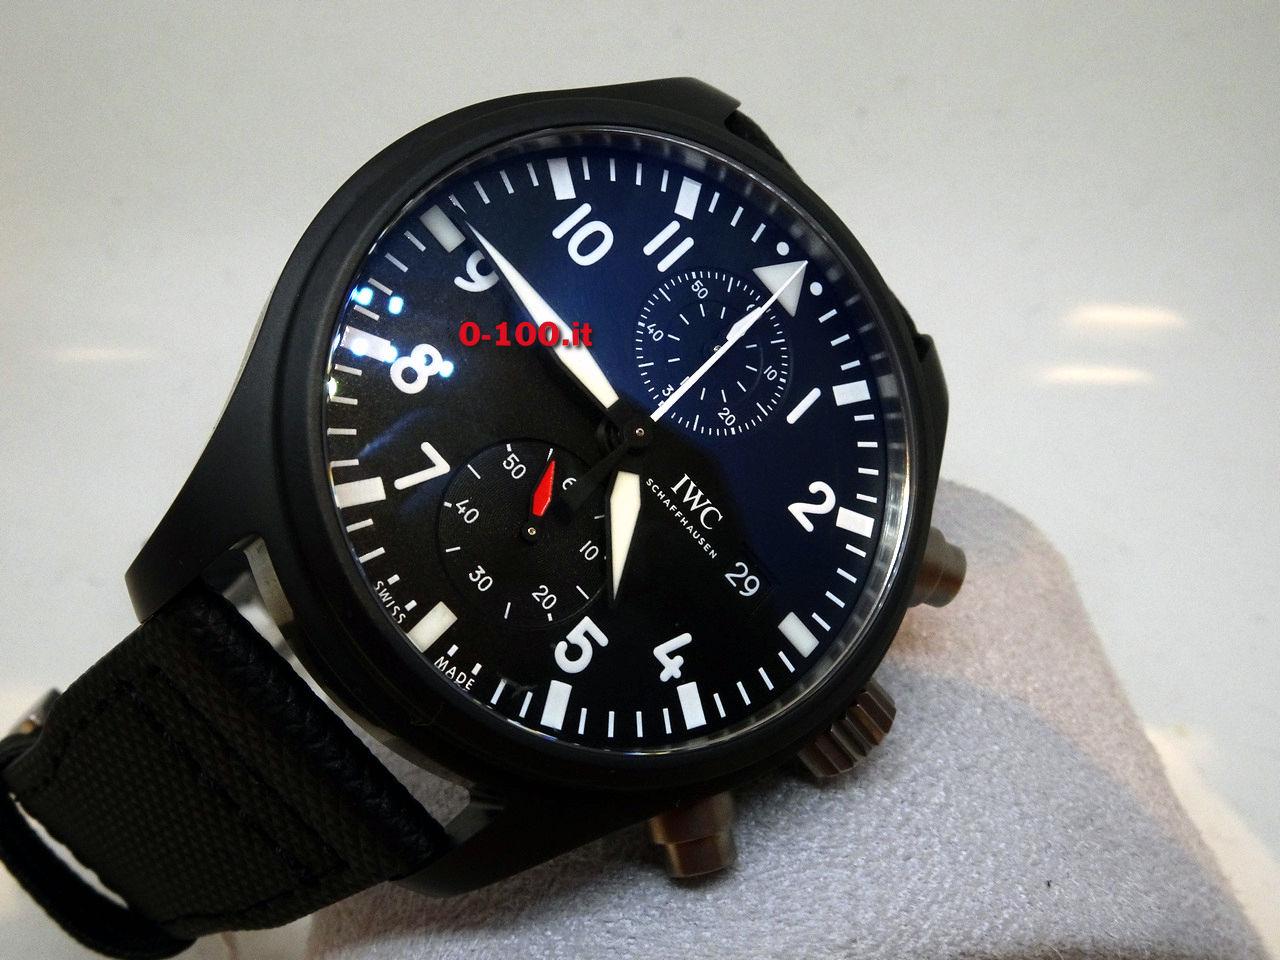 IWC_pilot_heritage-0-100_44